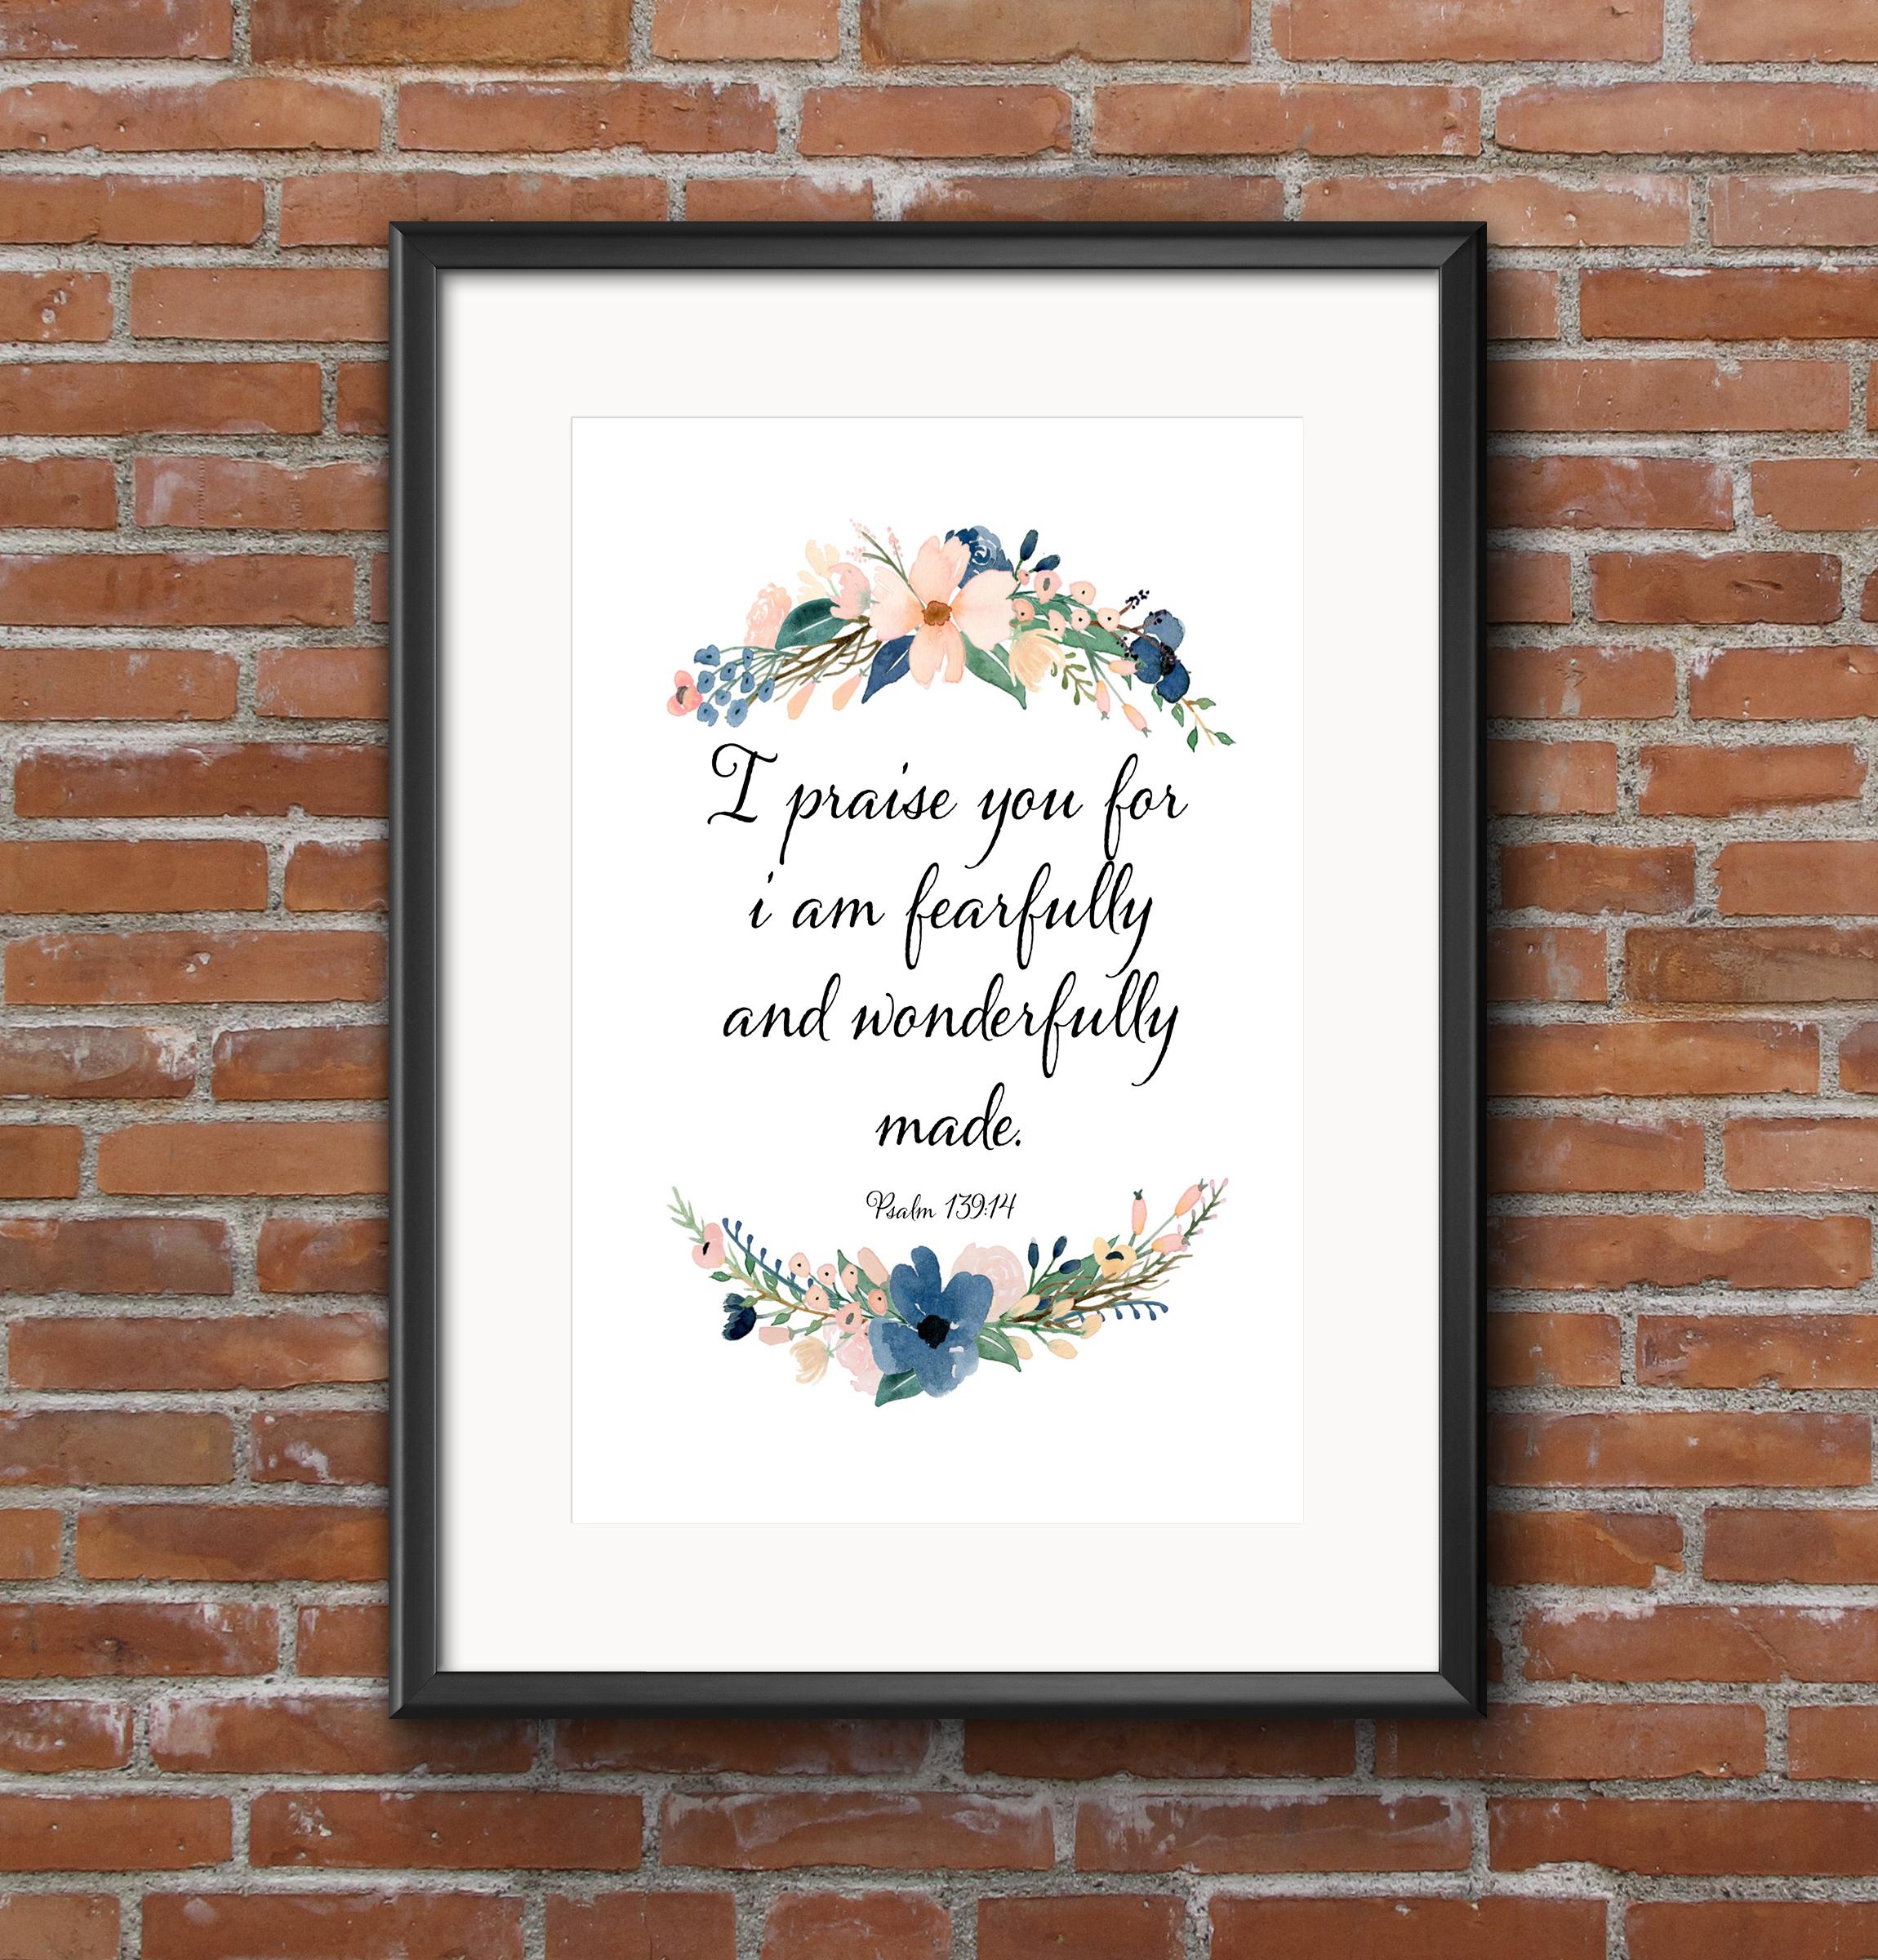 I am fearfully and Wonderfully made framed